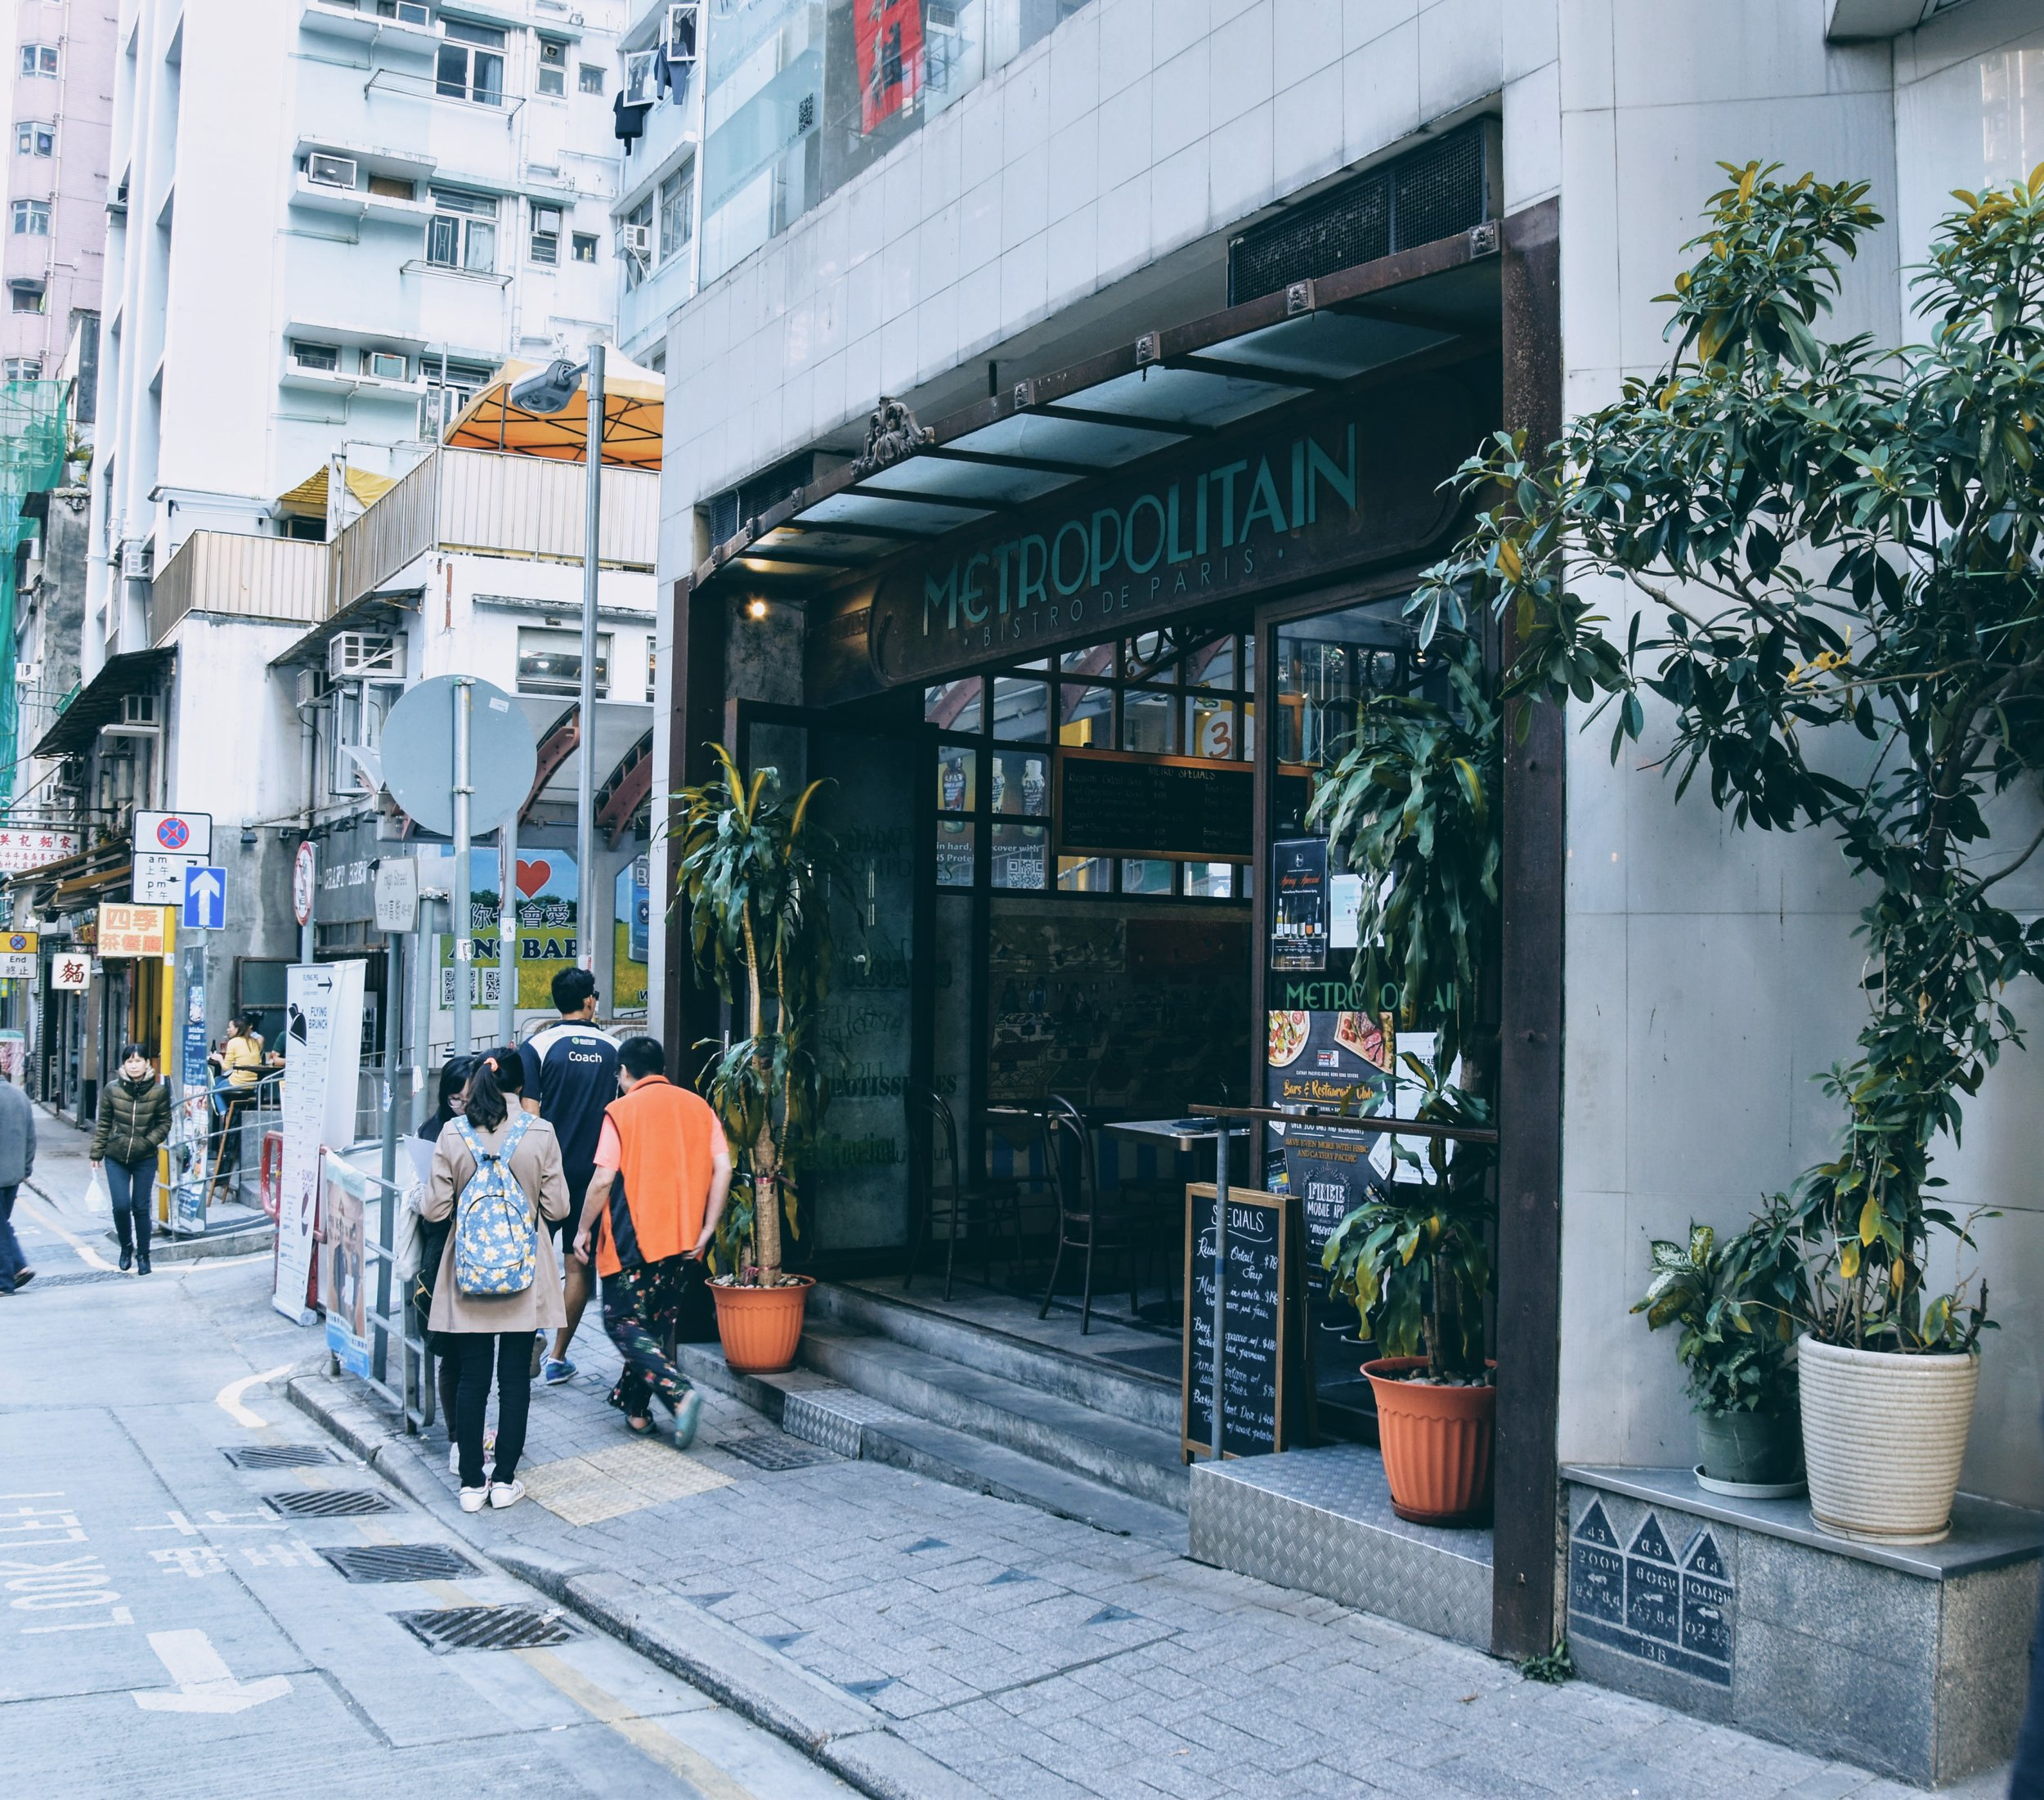 Metropolitain French Restaurant, High Street